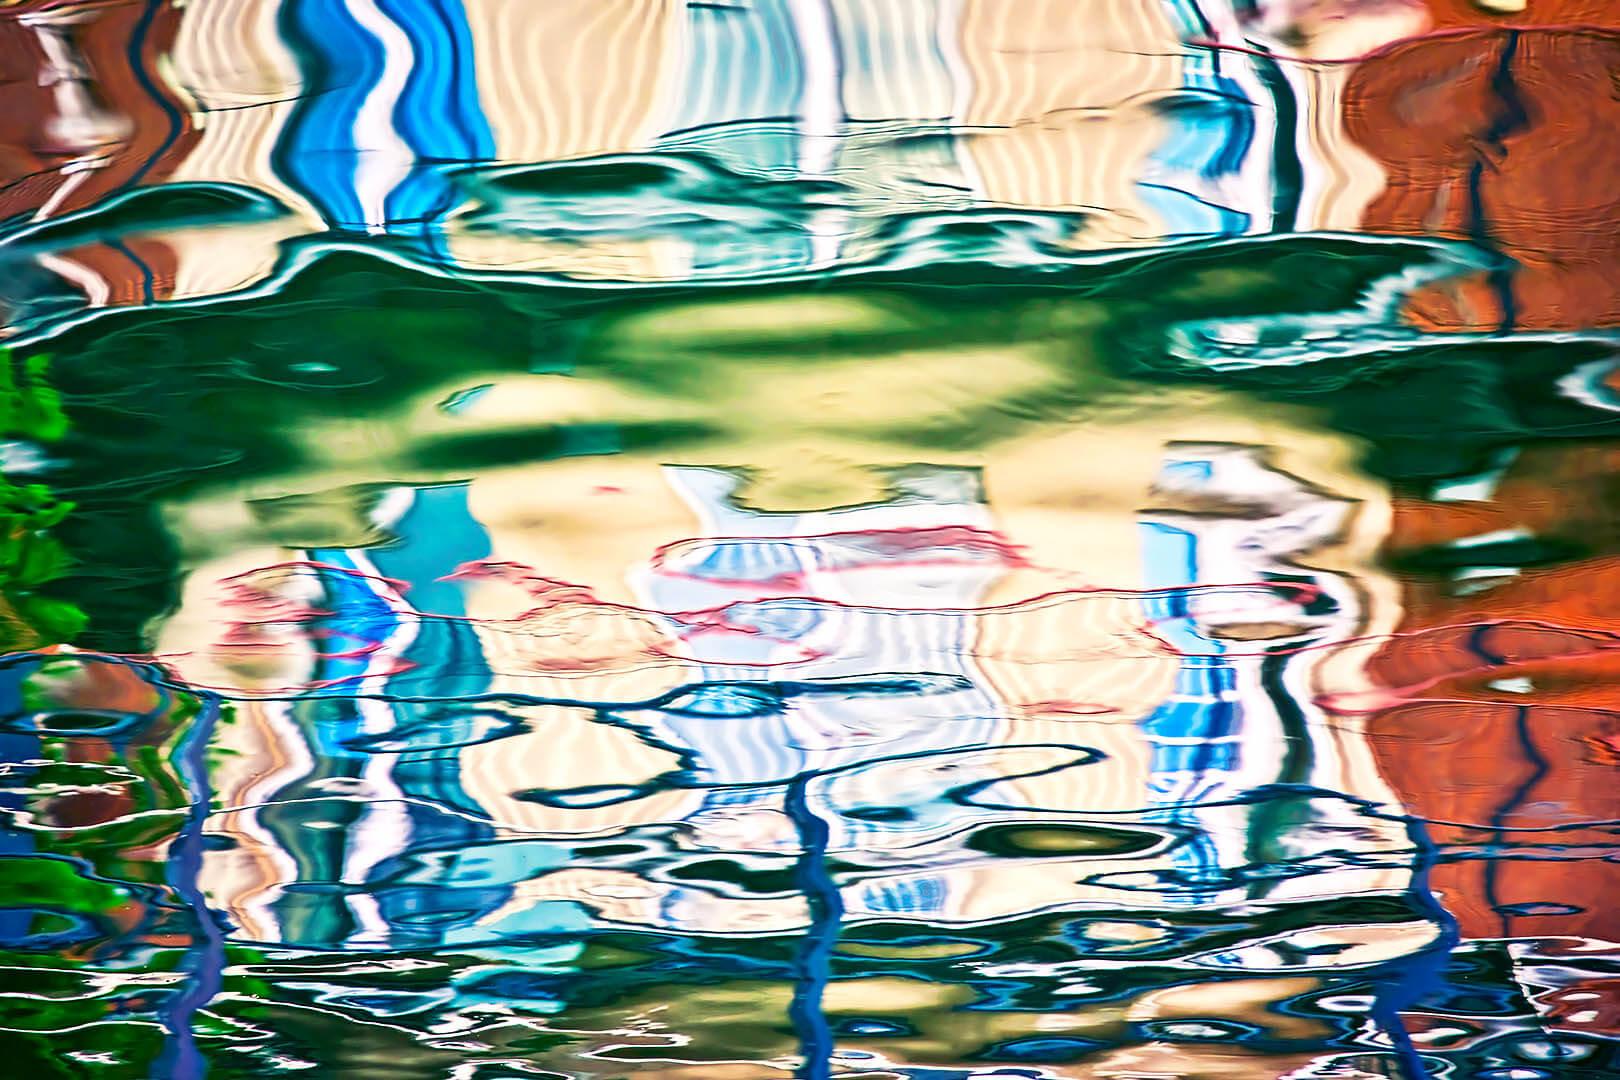 Gunwharf Quays Reflections IV